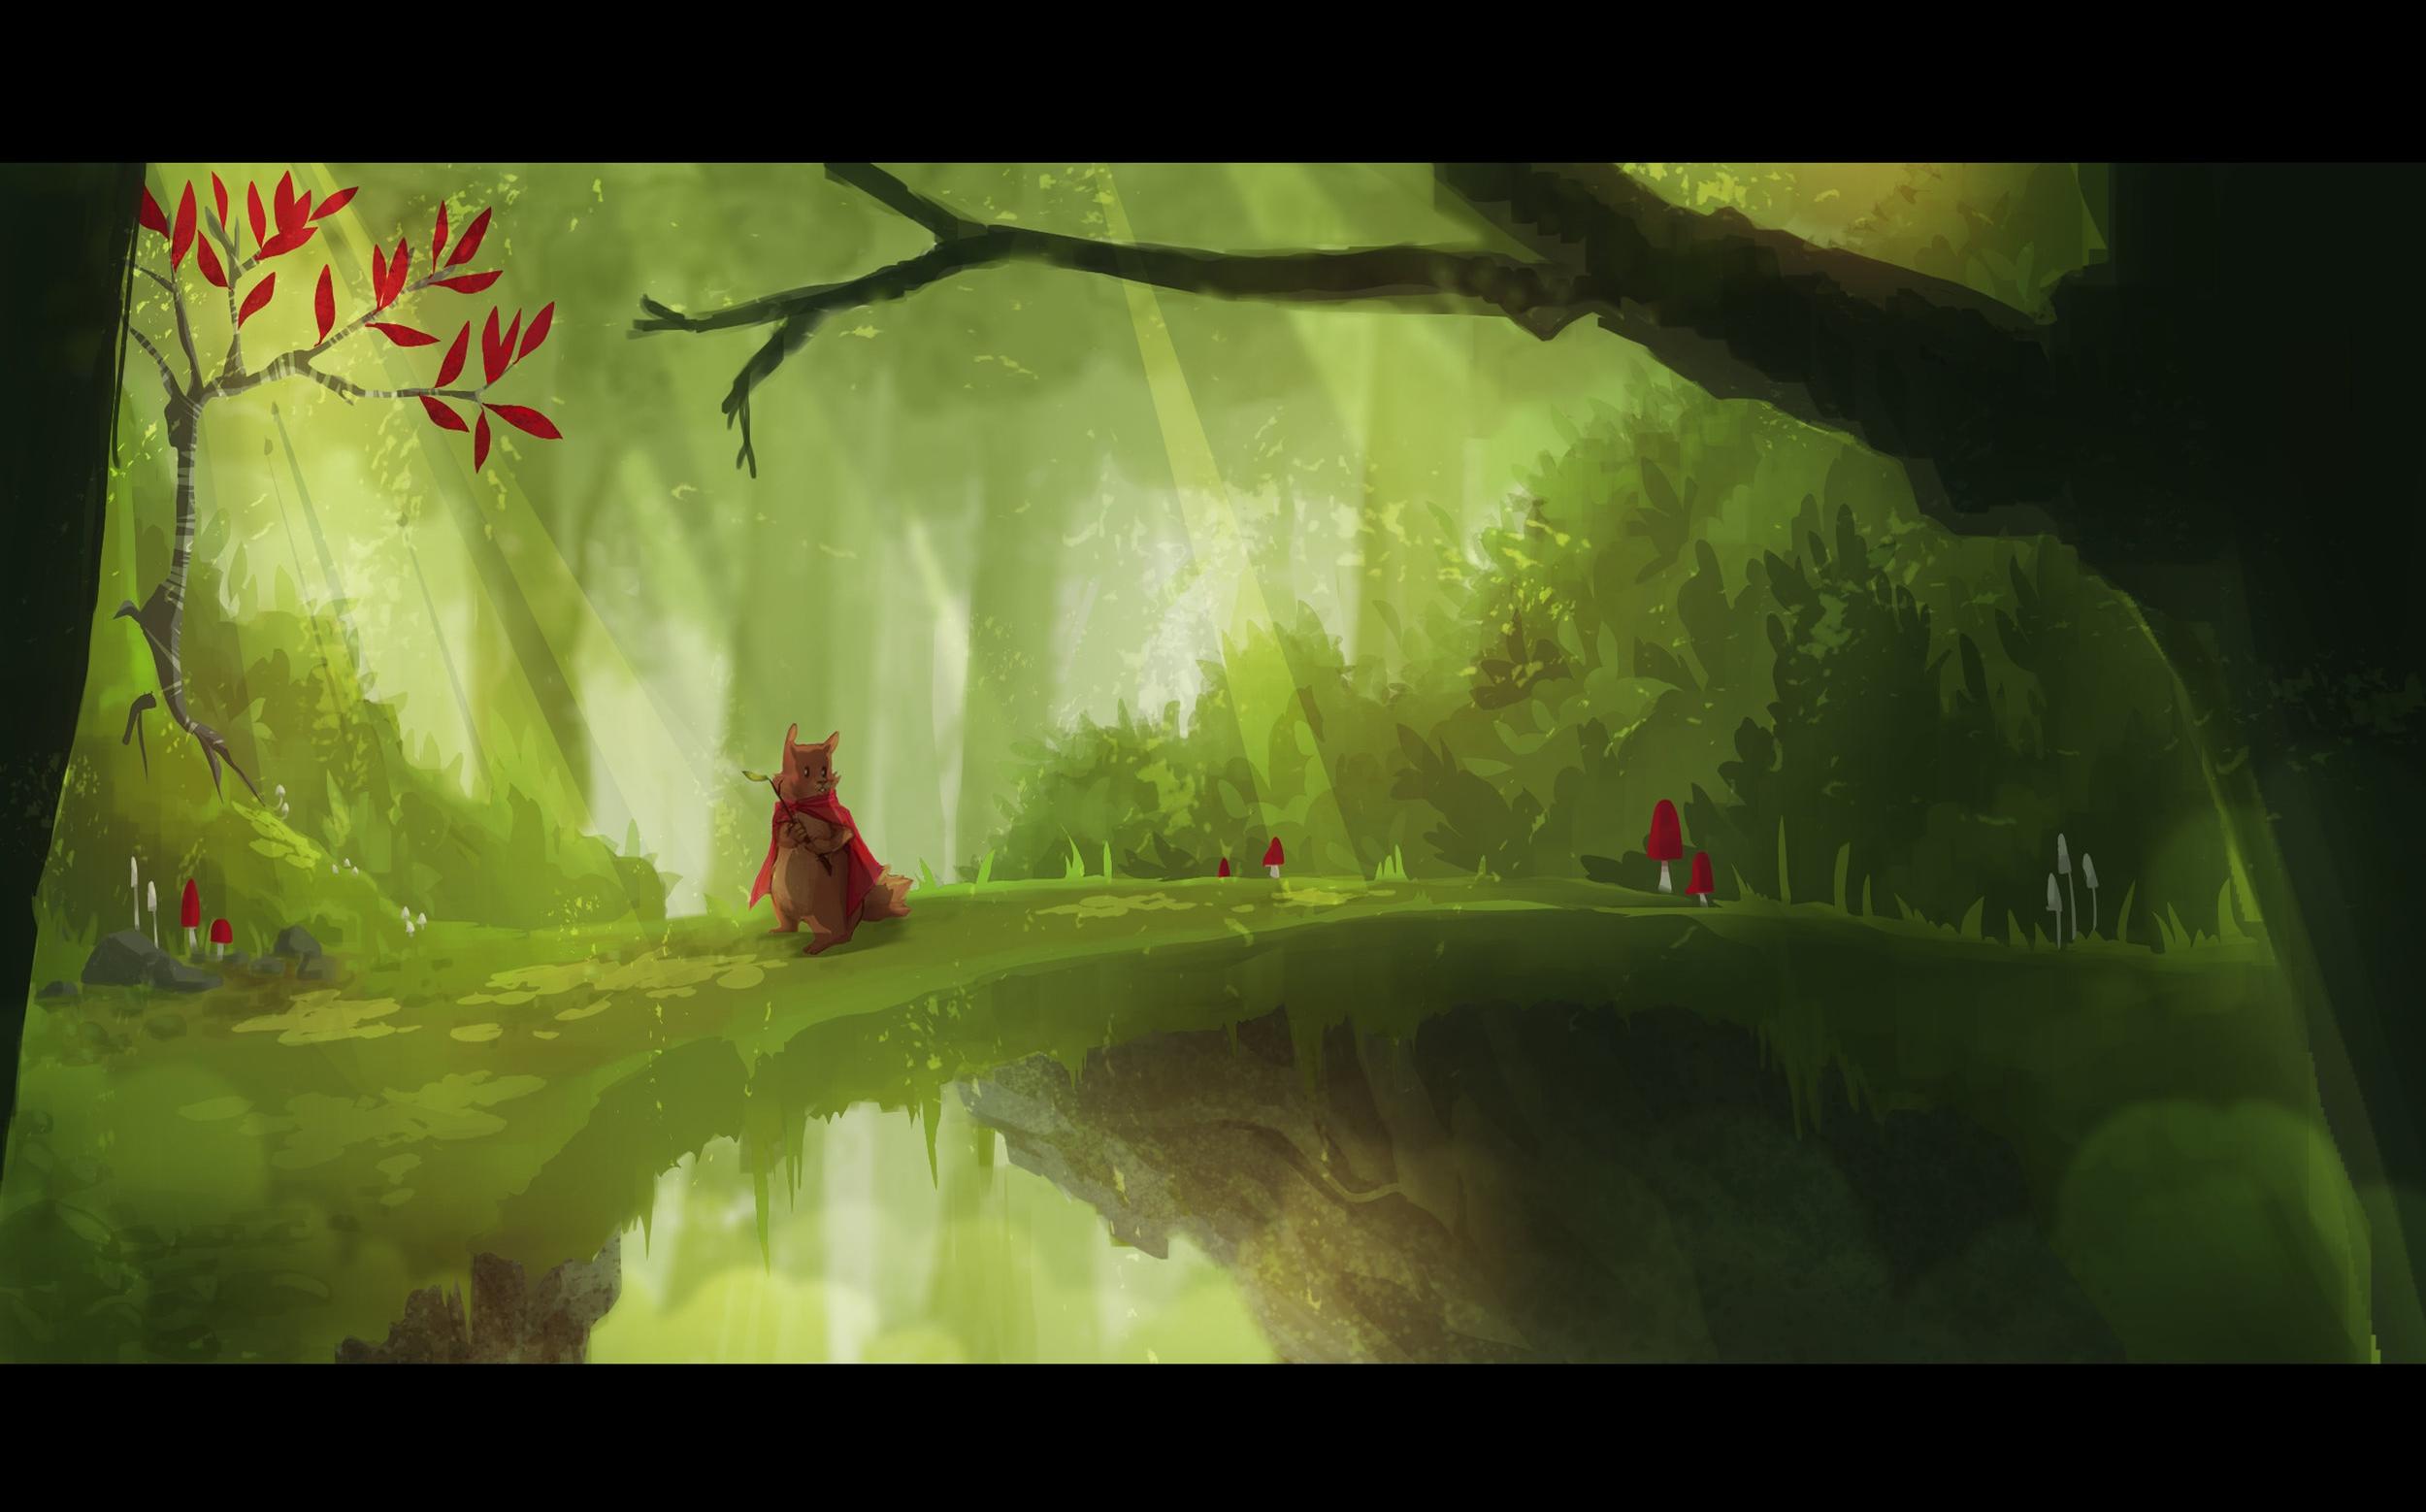 Environment painting 2.jpg